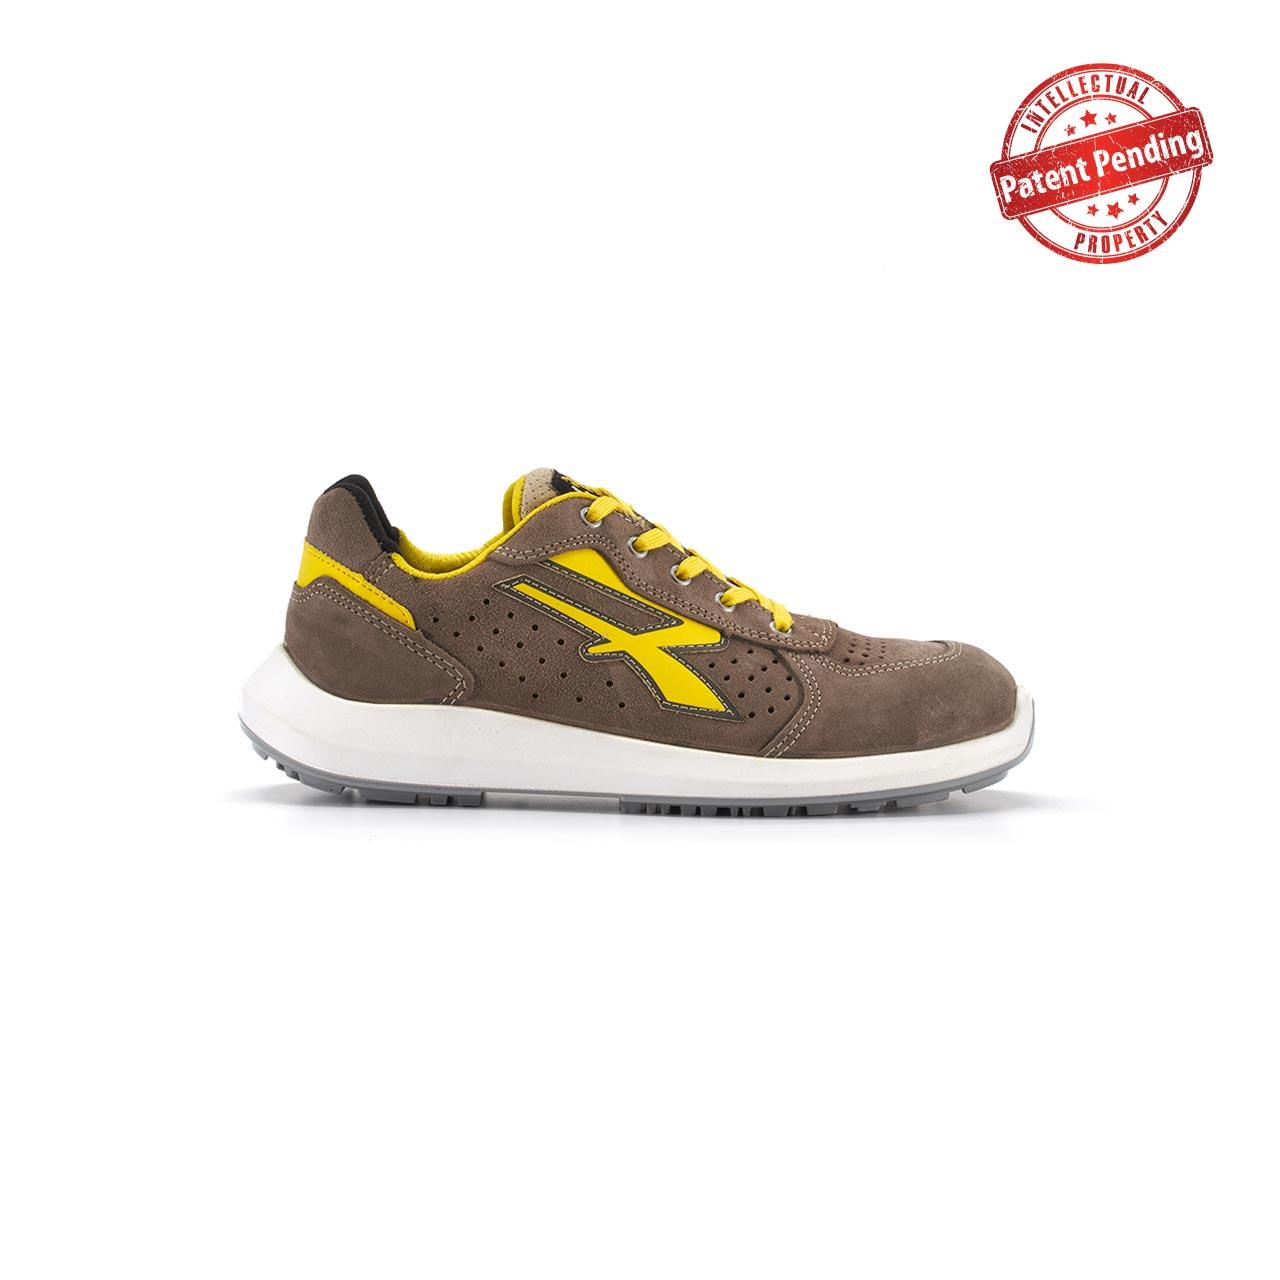 calzatura da lavoro upower modello dorado linea redup vista lato destro